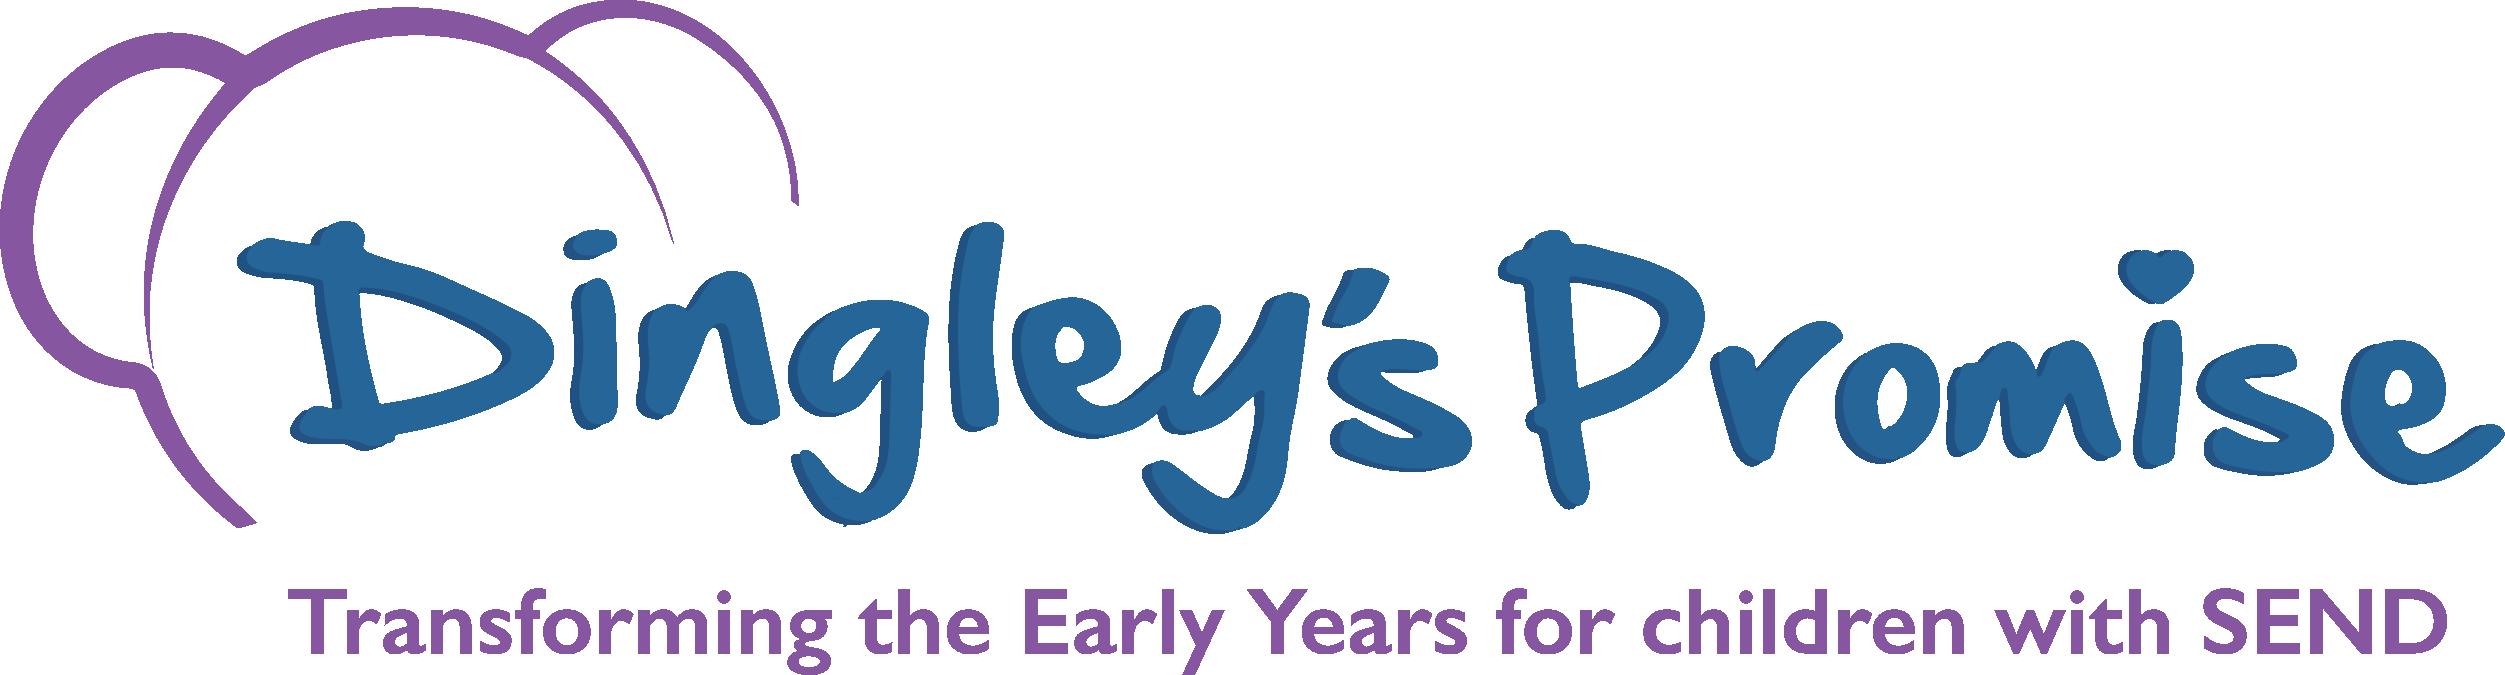 Dingley' Promise logo